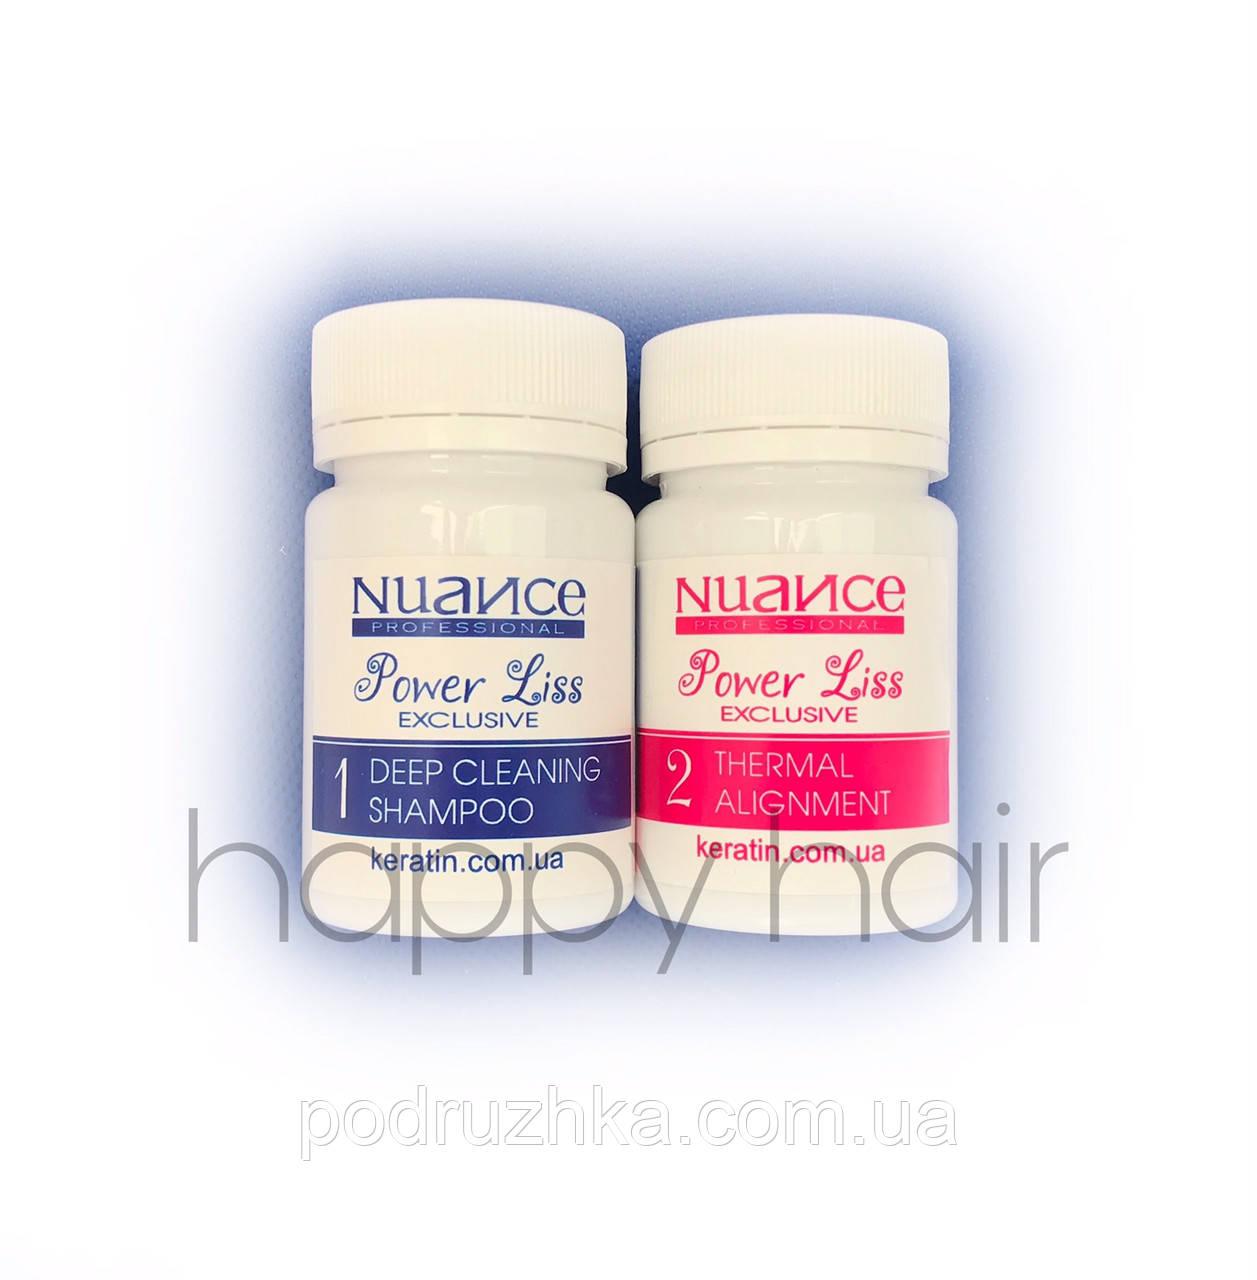 Nuance Power Liss Набір для кератинового выпрямлениия 2х100 г